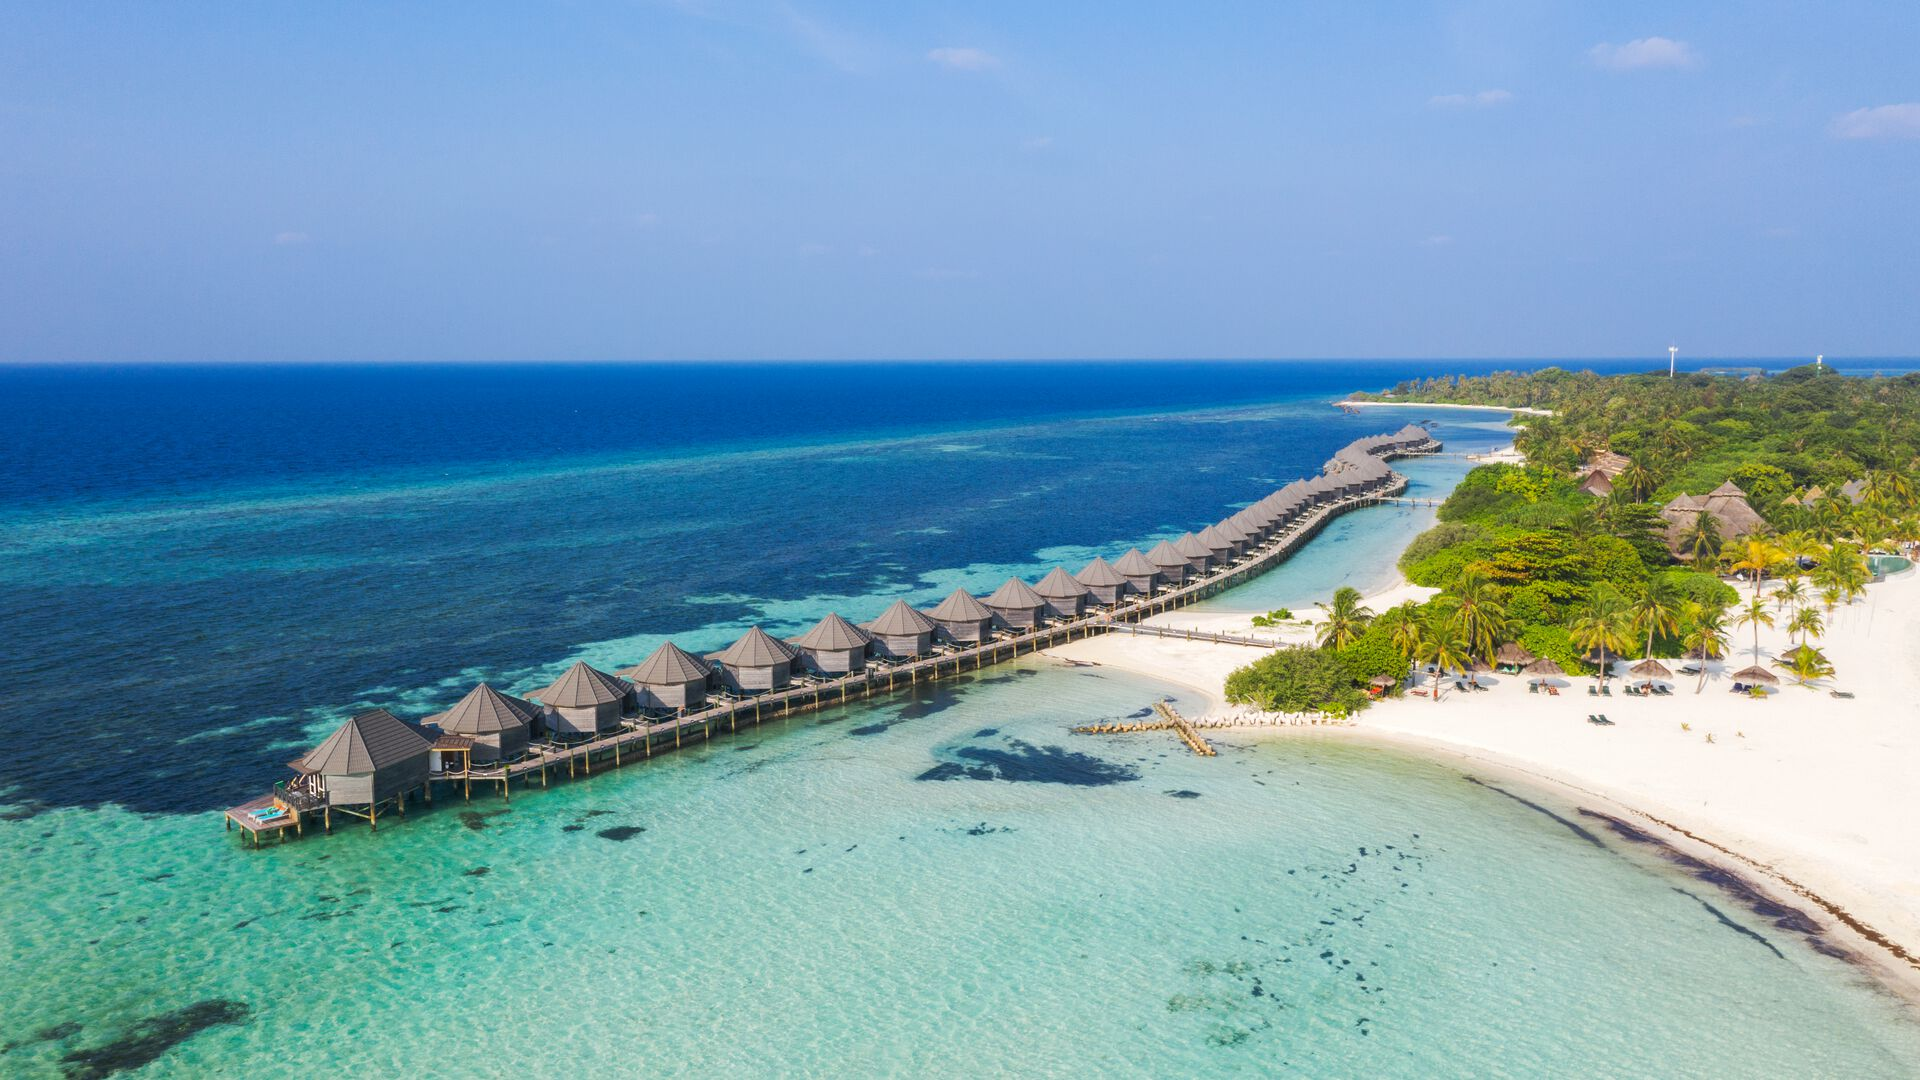 Kuredu Island Resort & Spa - transfert inclus - 4*